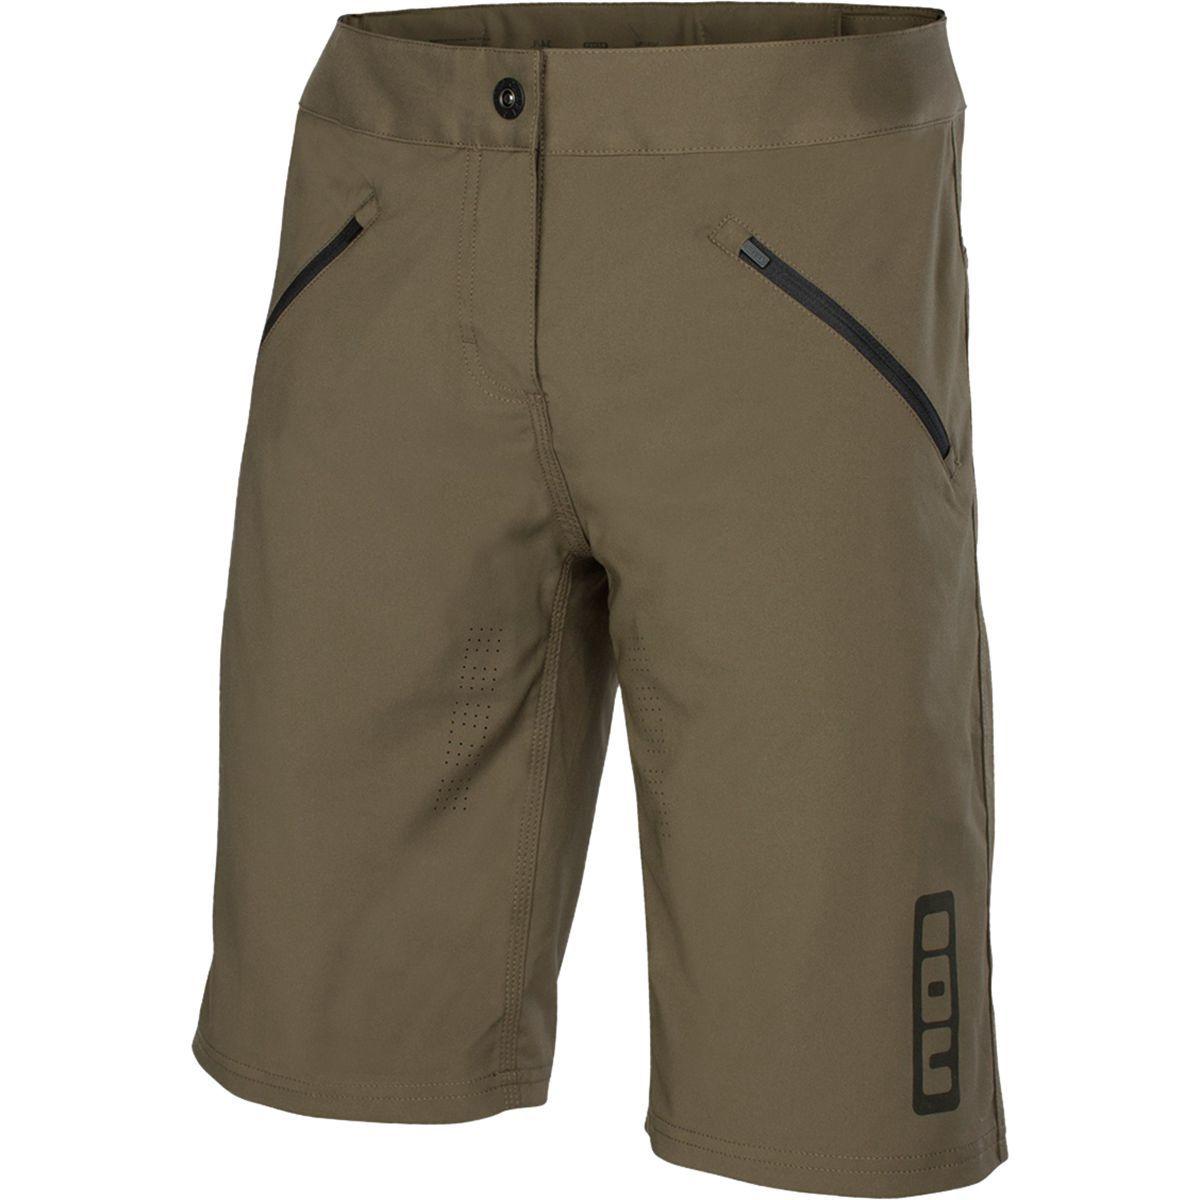 ION Traze Bike Short - Men's